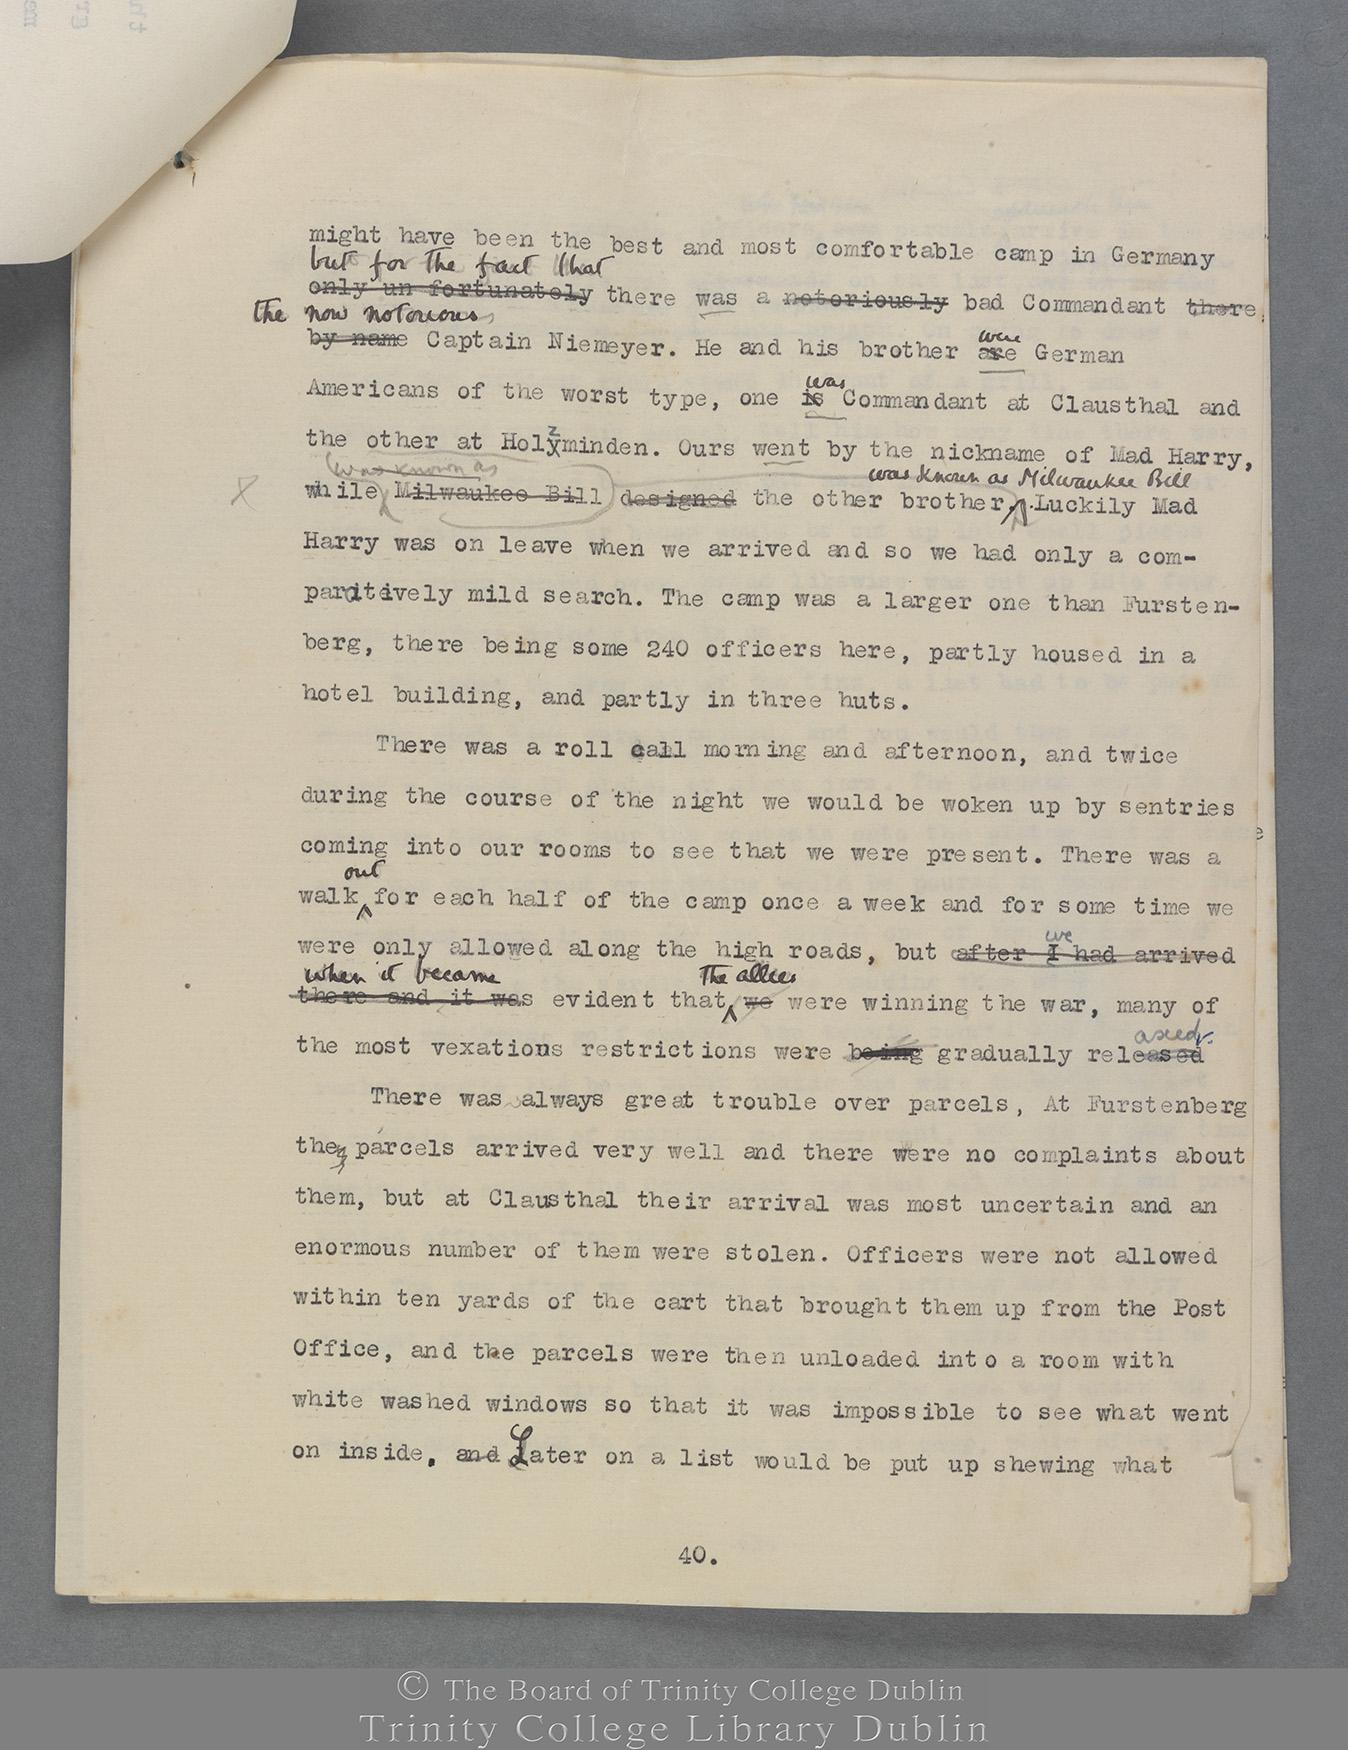 TCD MS 10823 folio 40 recto